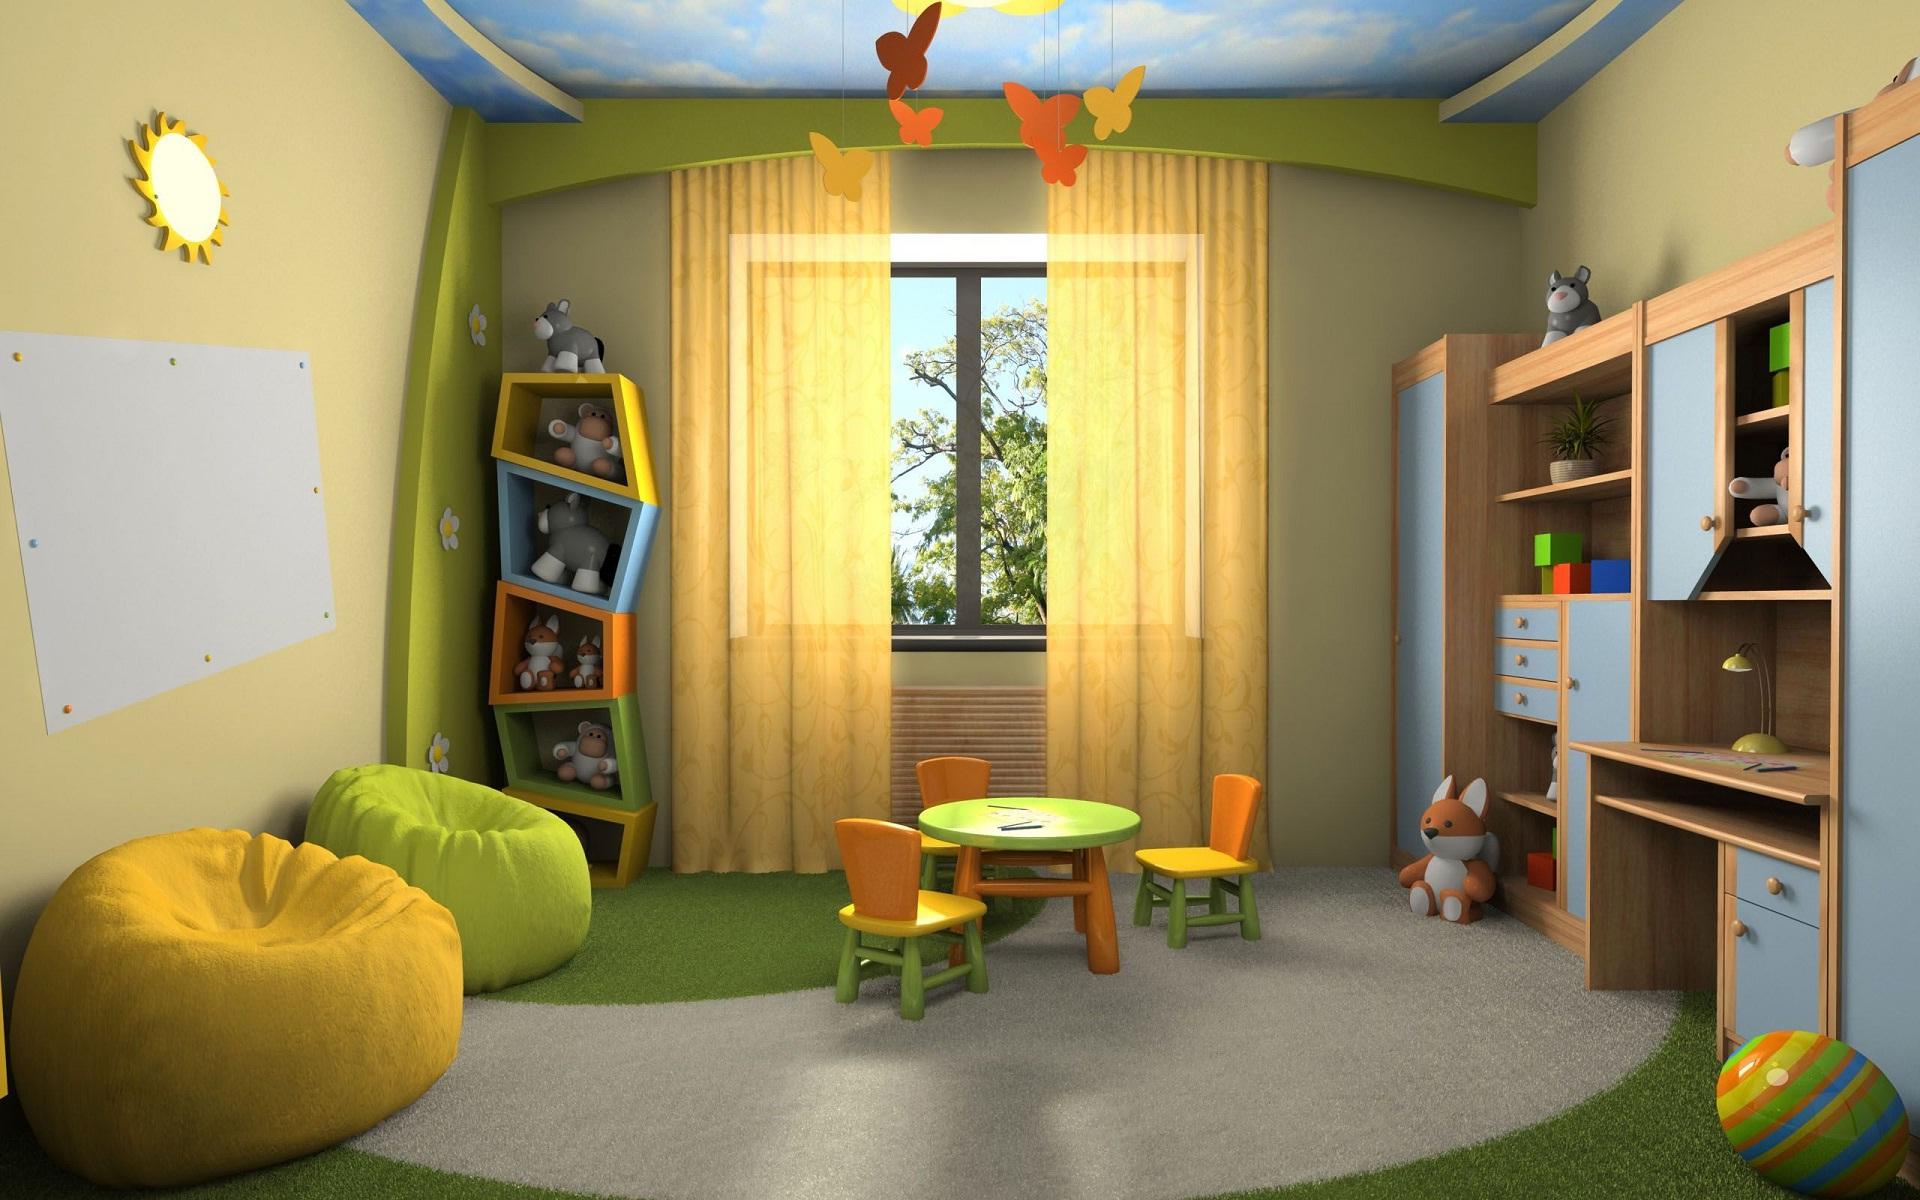 Kids drawing room interior HD wallpapers